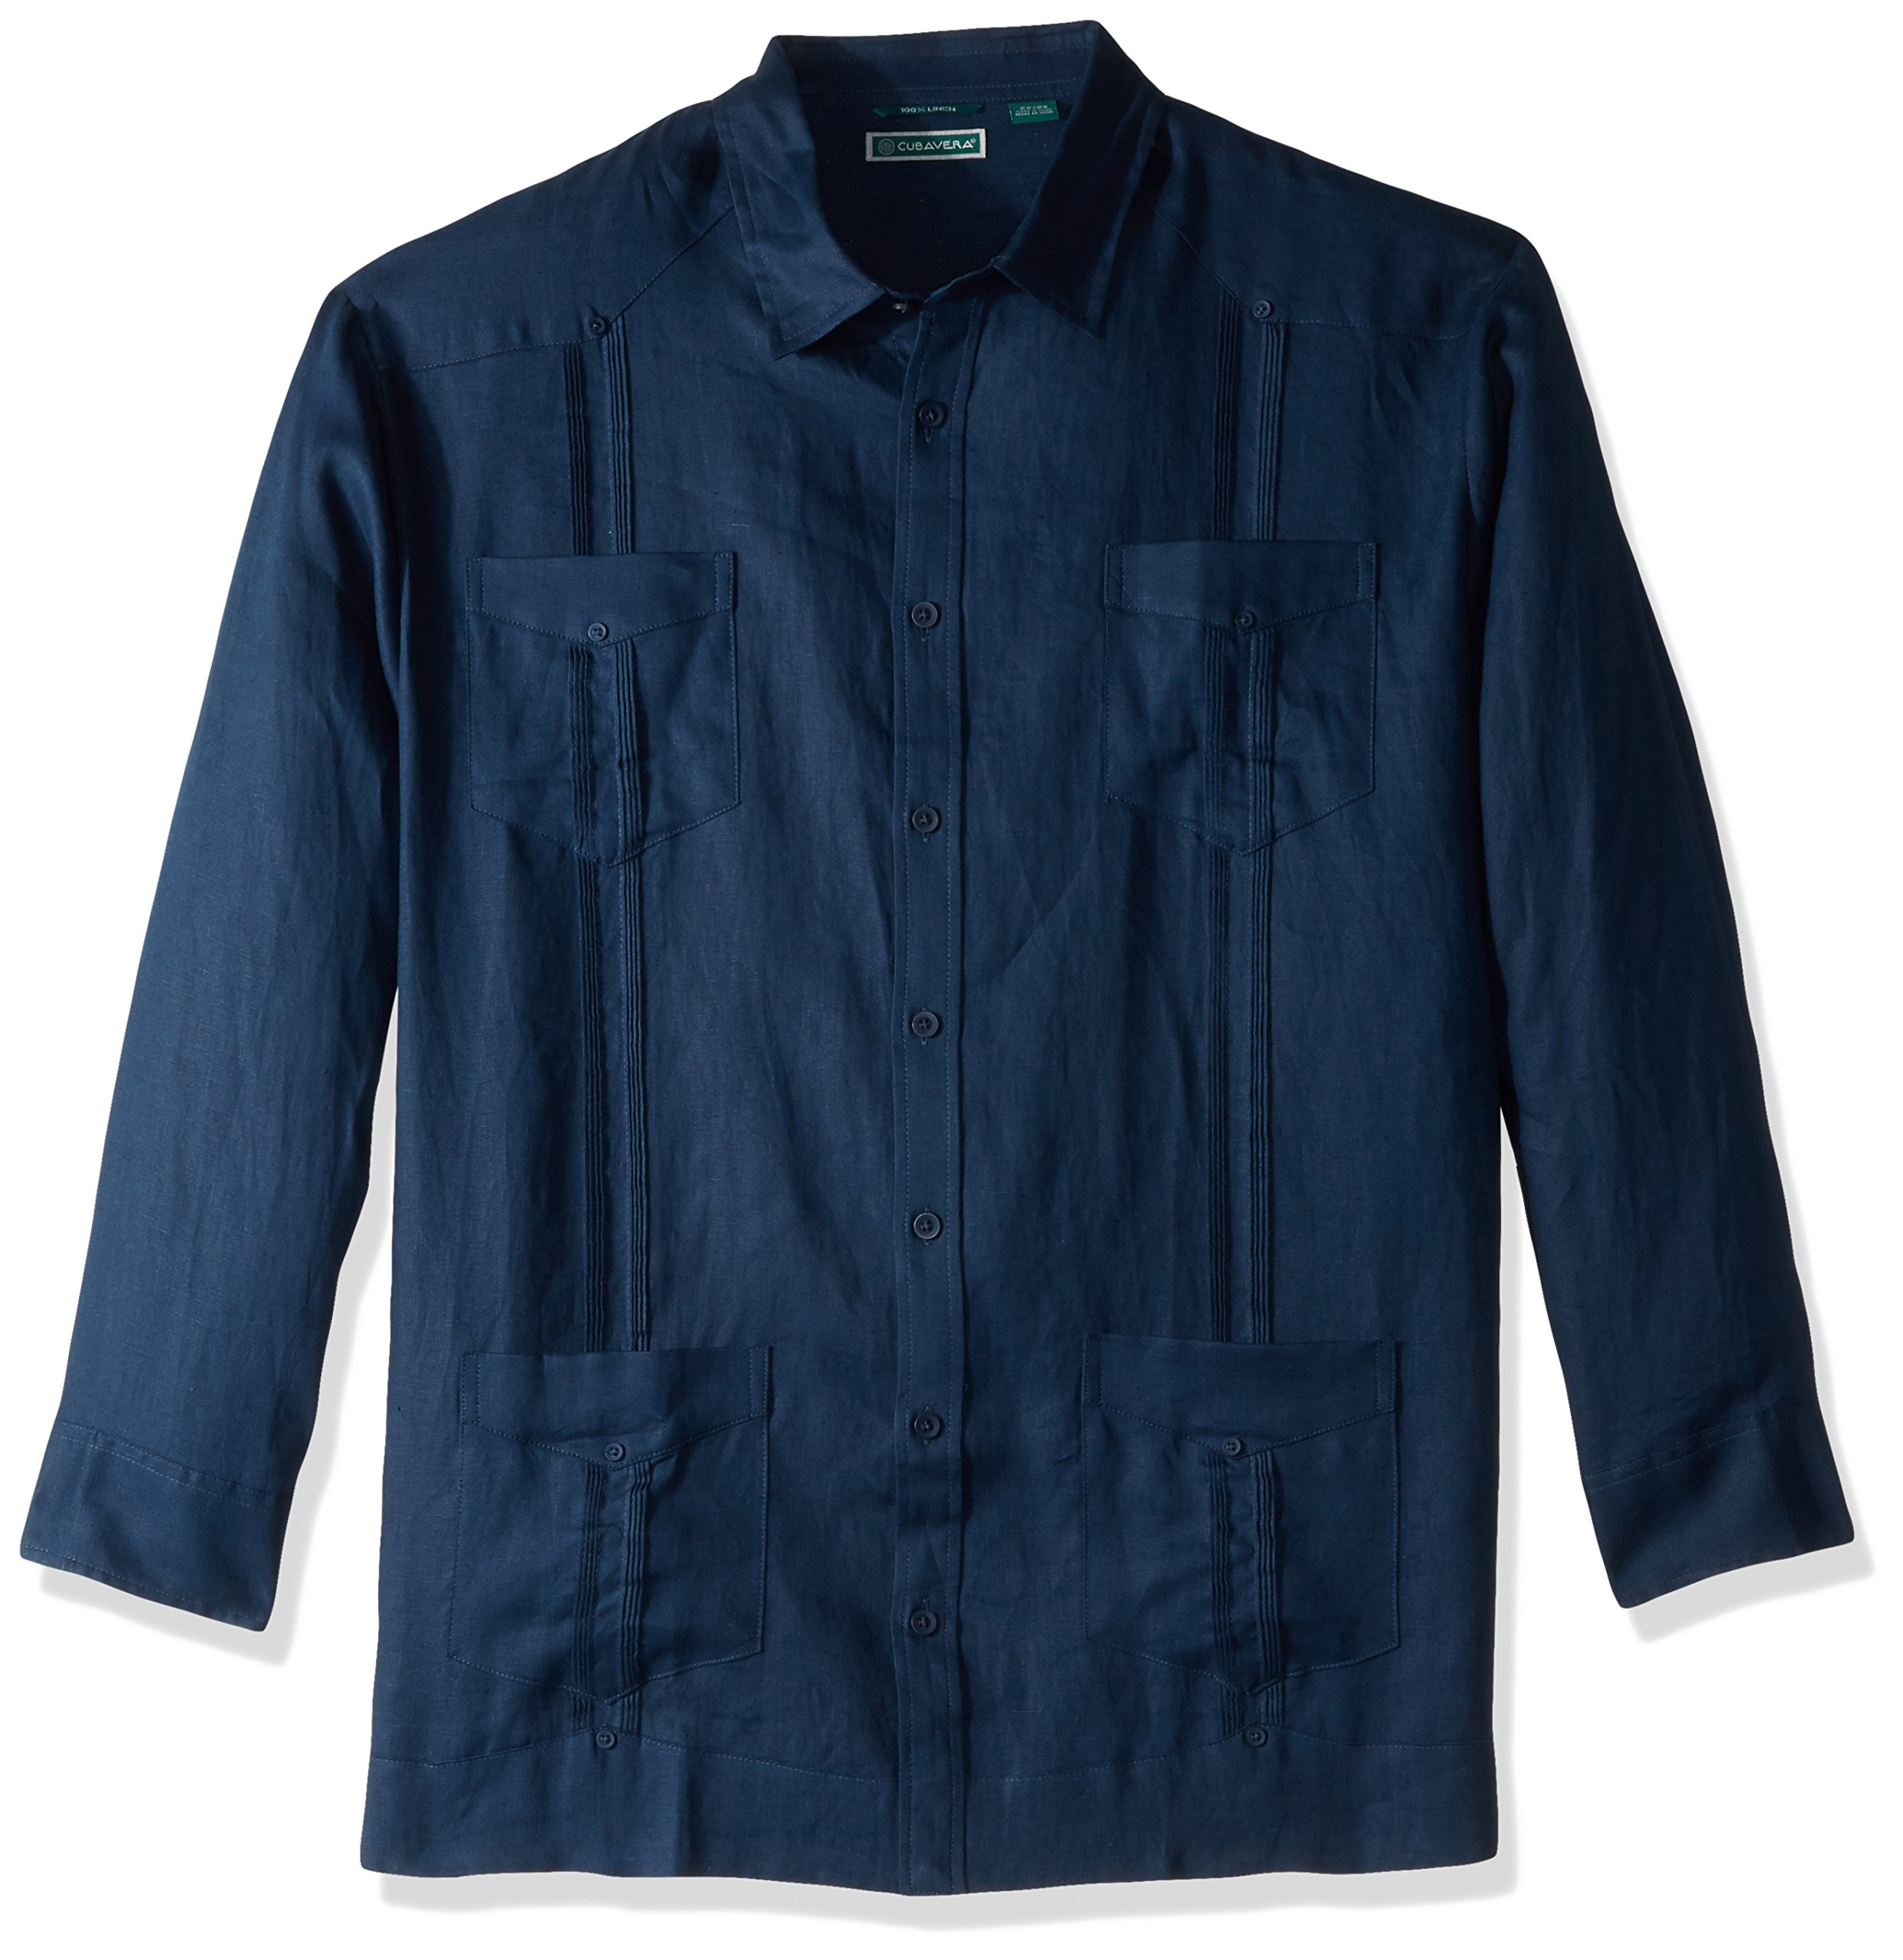 Cubavera Men's Big and Tall Long-Sleeve 100% Linen Guayabera Shirt, Dress Blues, 3X